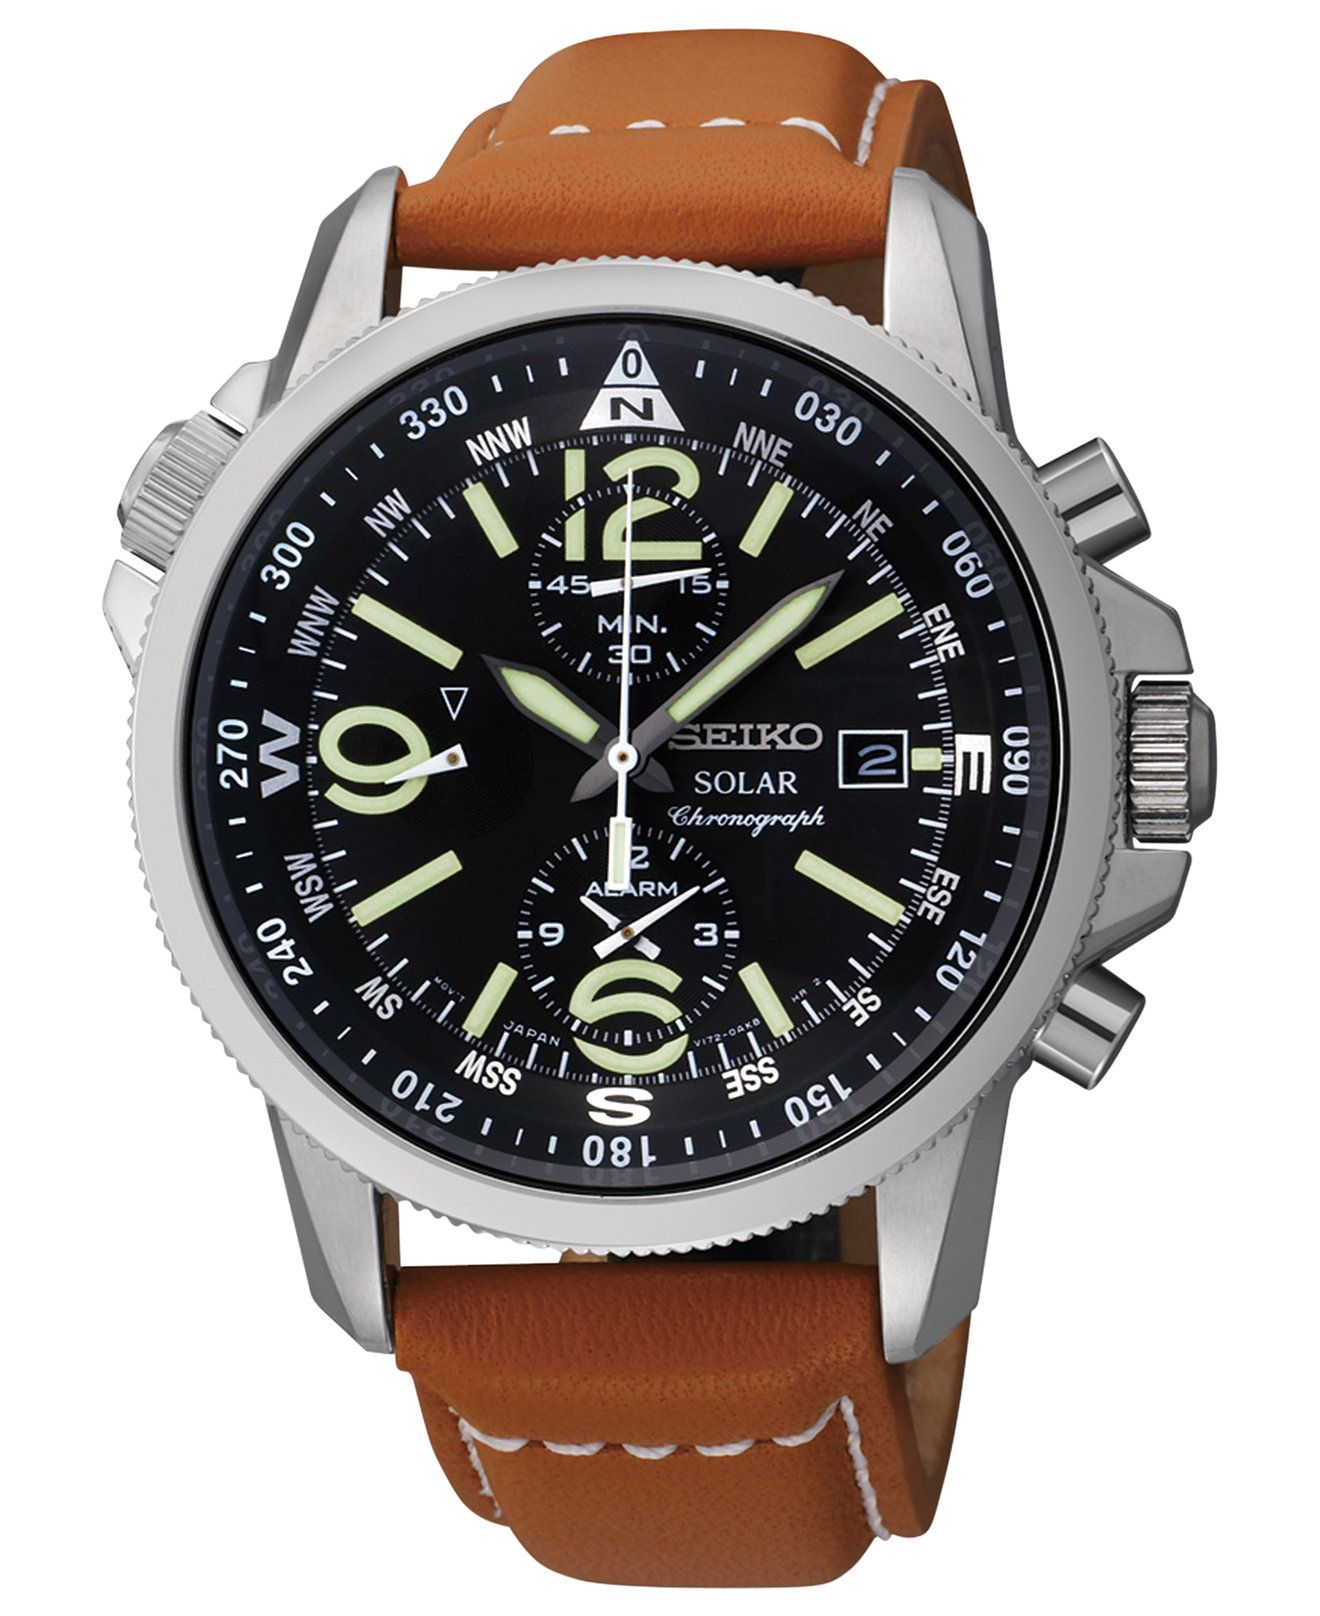 5e6e438de Seiko Watch, Men's Chronograph Solar Tan Leather Strap 42mm SSC081 - Watches  - Jewelry & Watches - Macy's